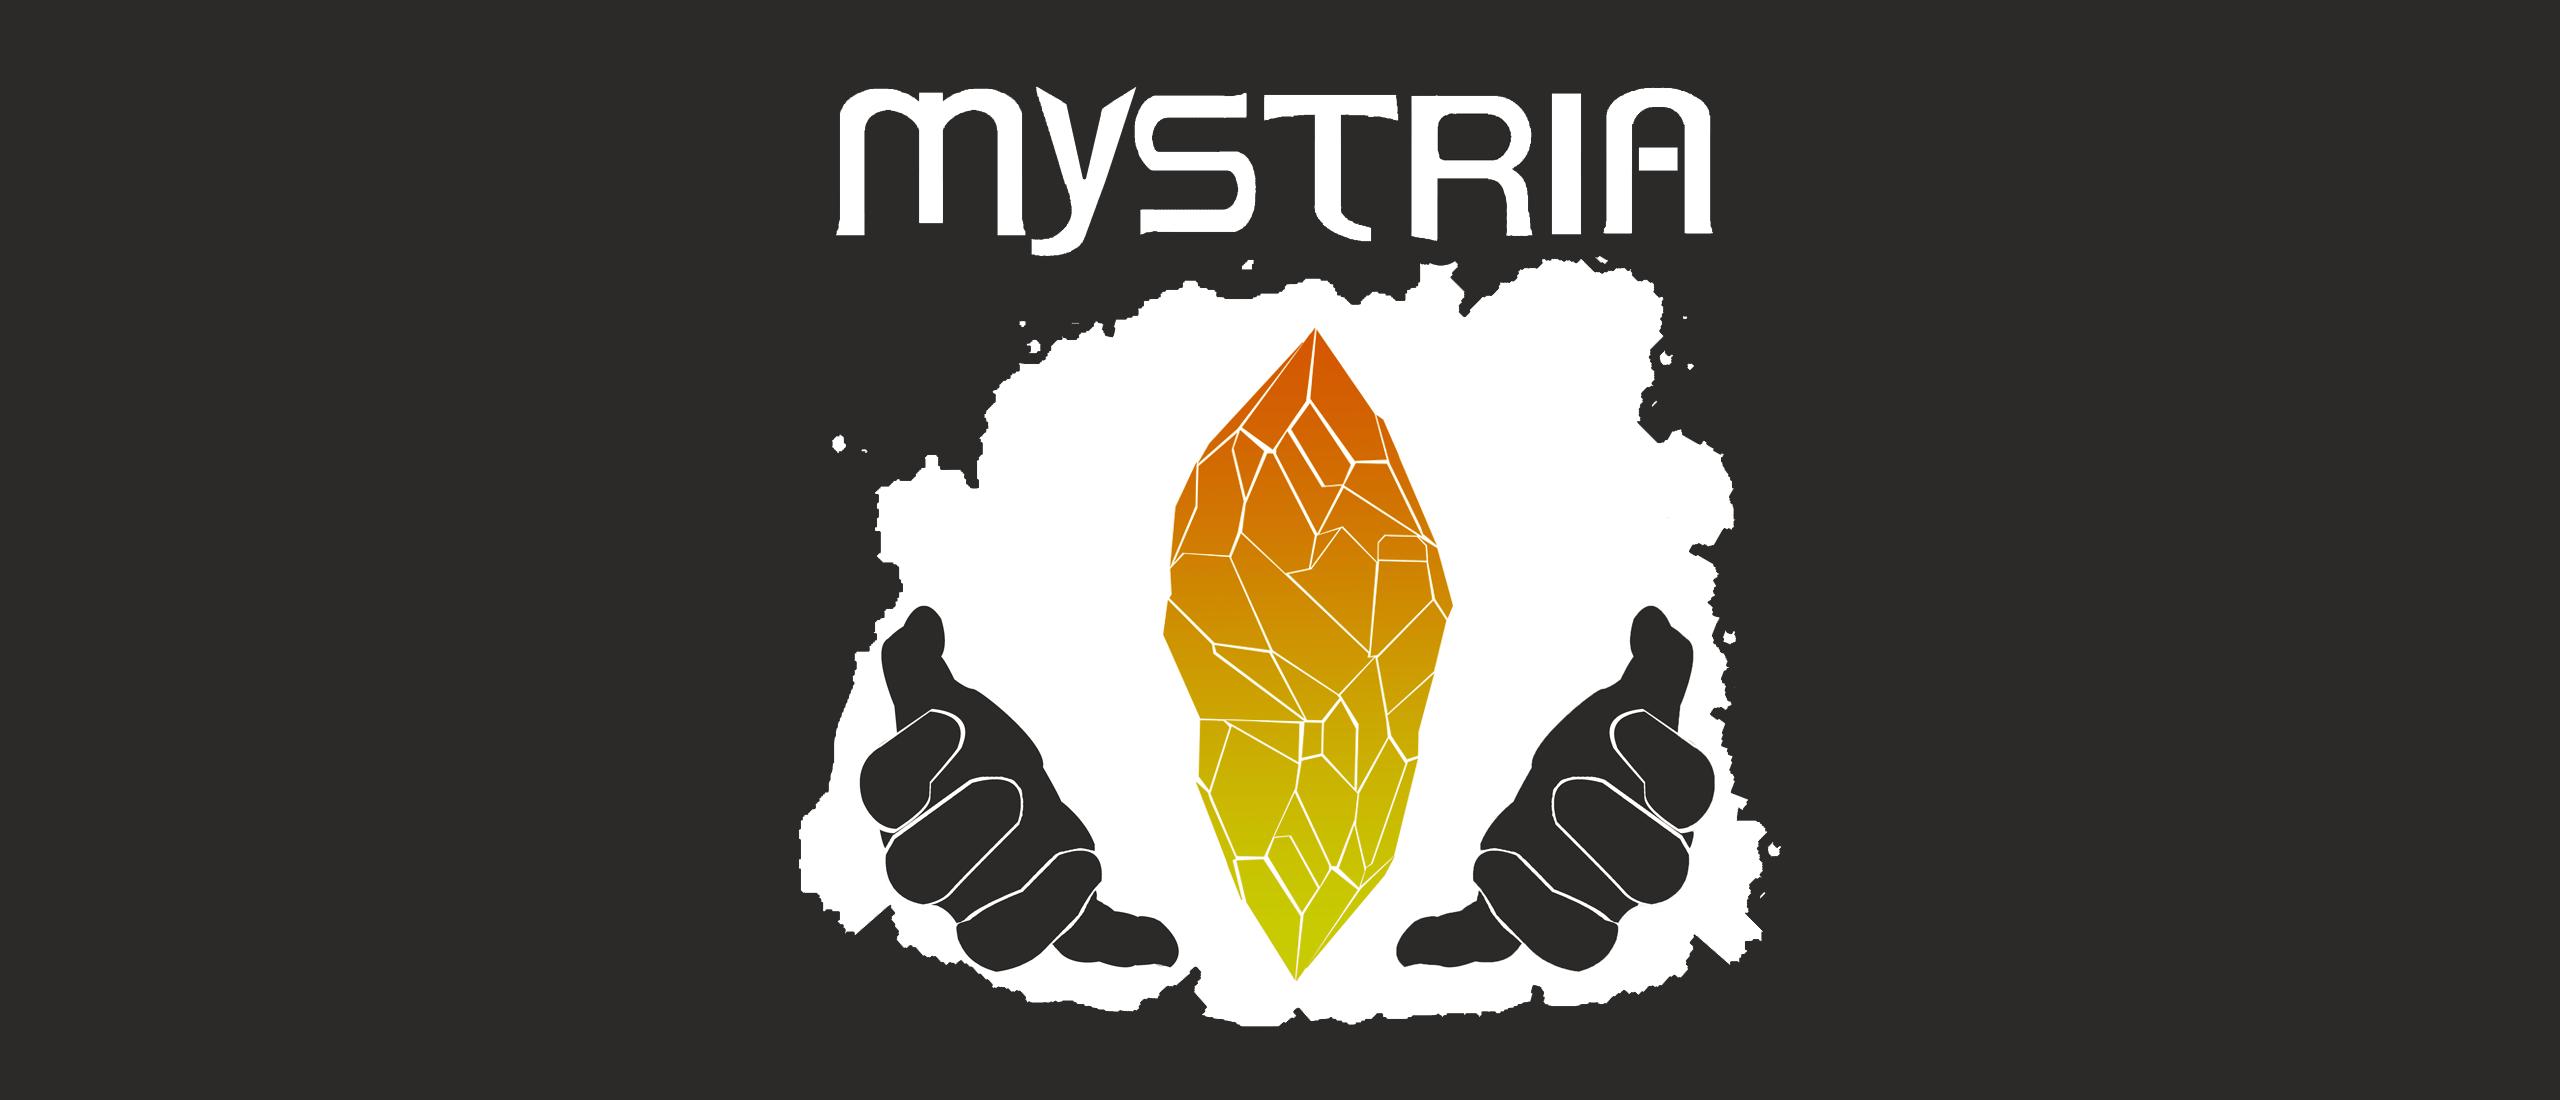 Mystria